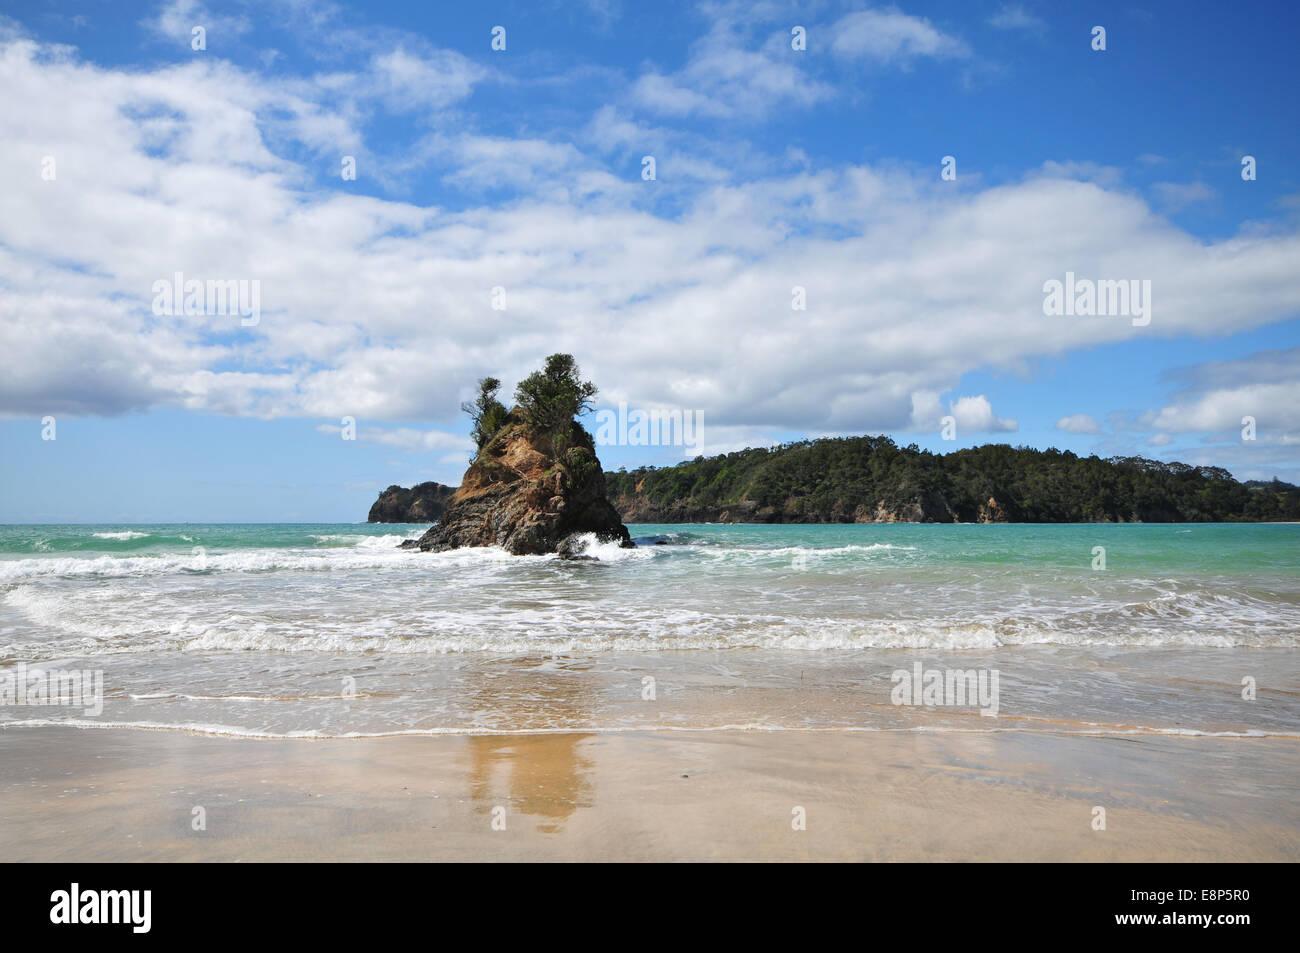 Flat sandy beach with coastal rocks at low tide in Matapouri, Tutukaka Coast in New Zealand. - Stock Image